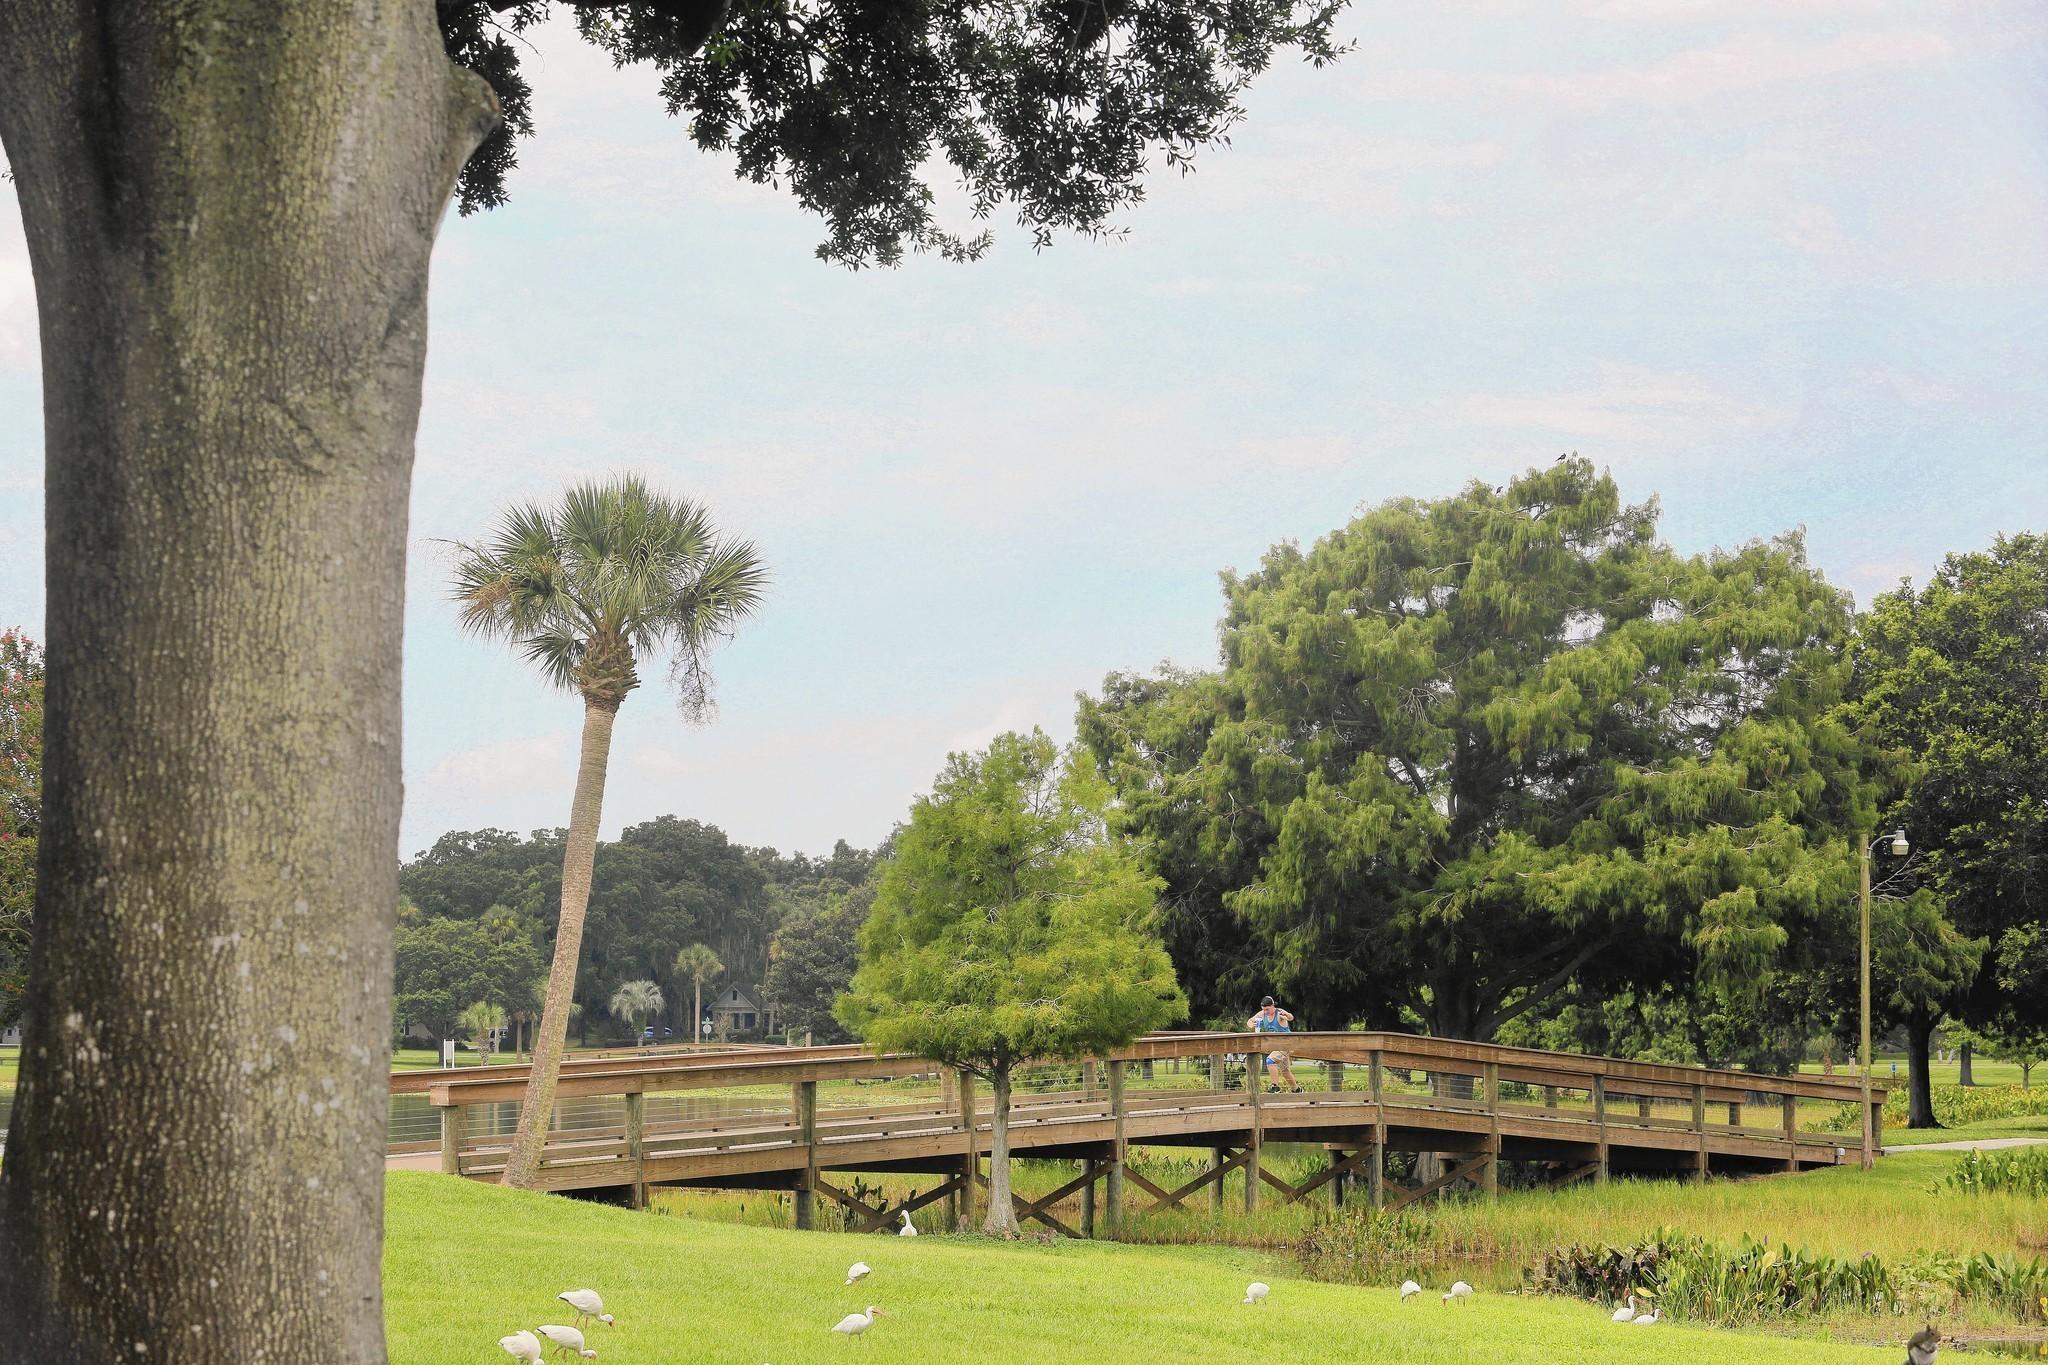 Leesburg Looks To Restore Luster To Aging Venetian Gardens   Orlando  Sentinel